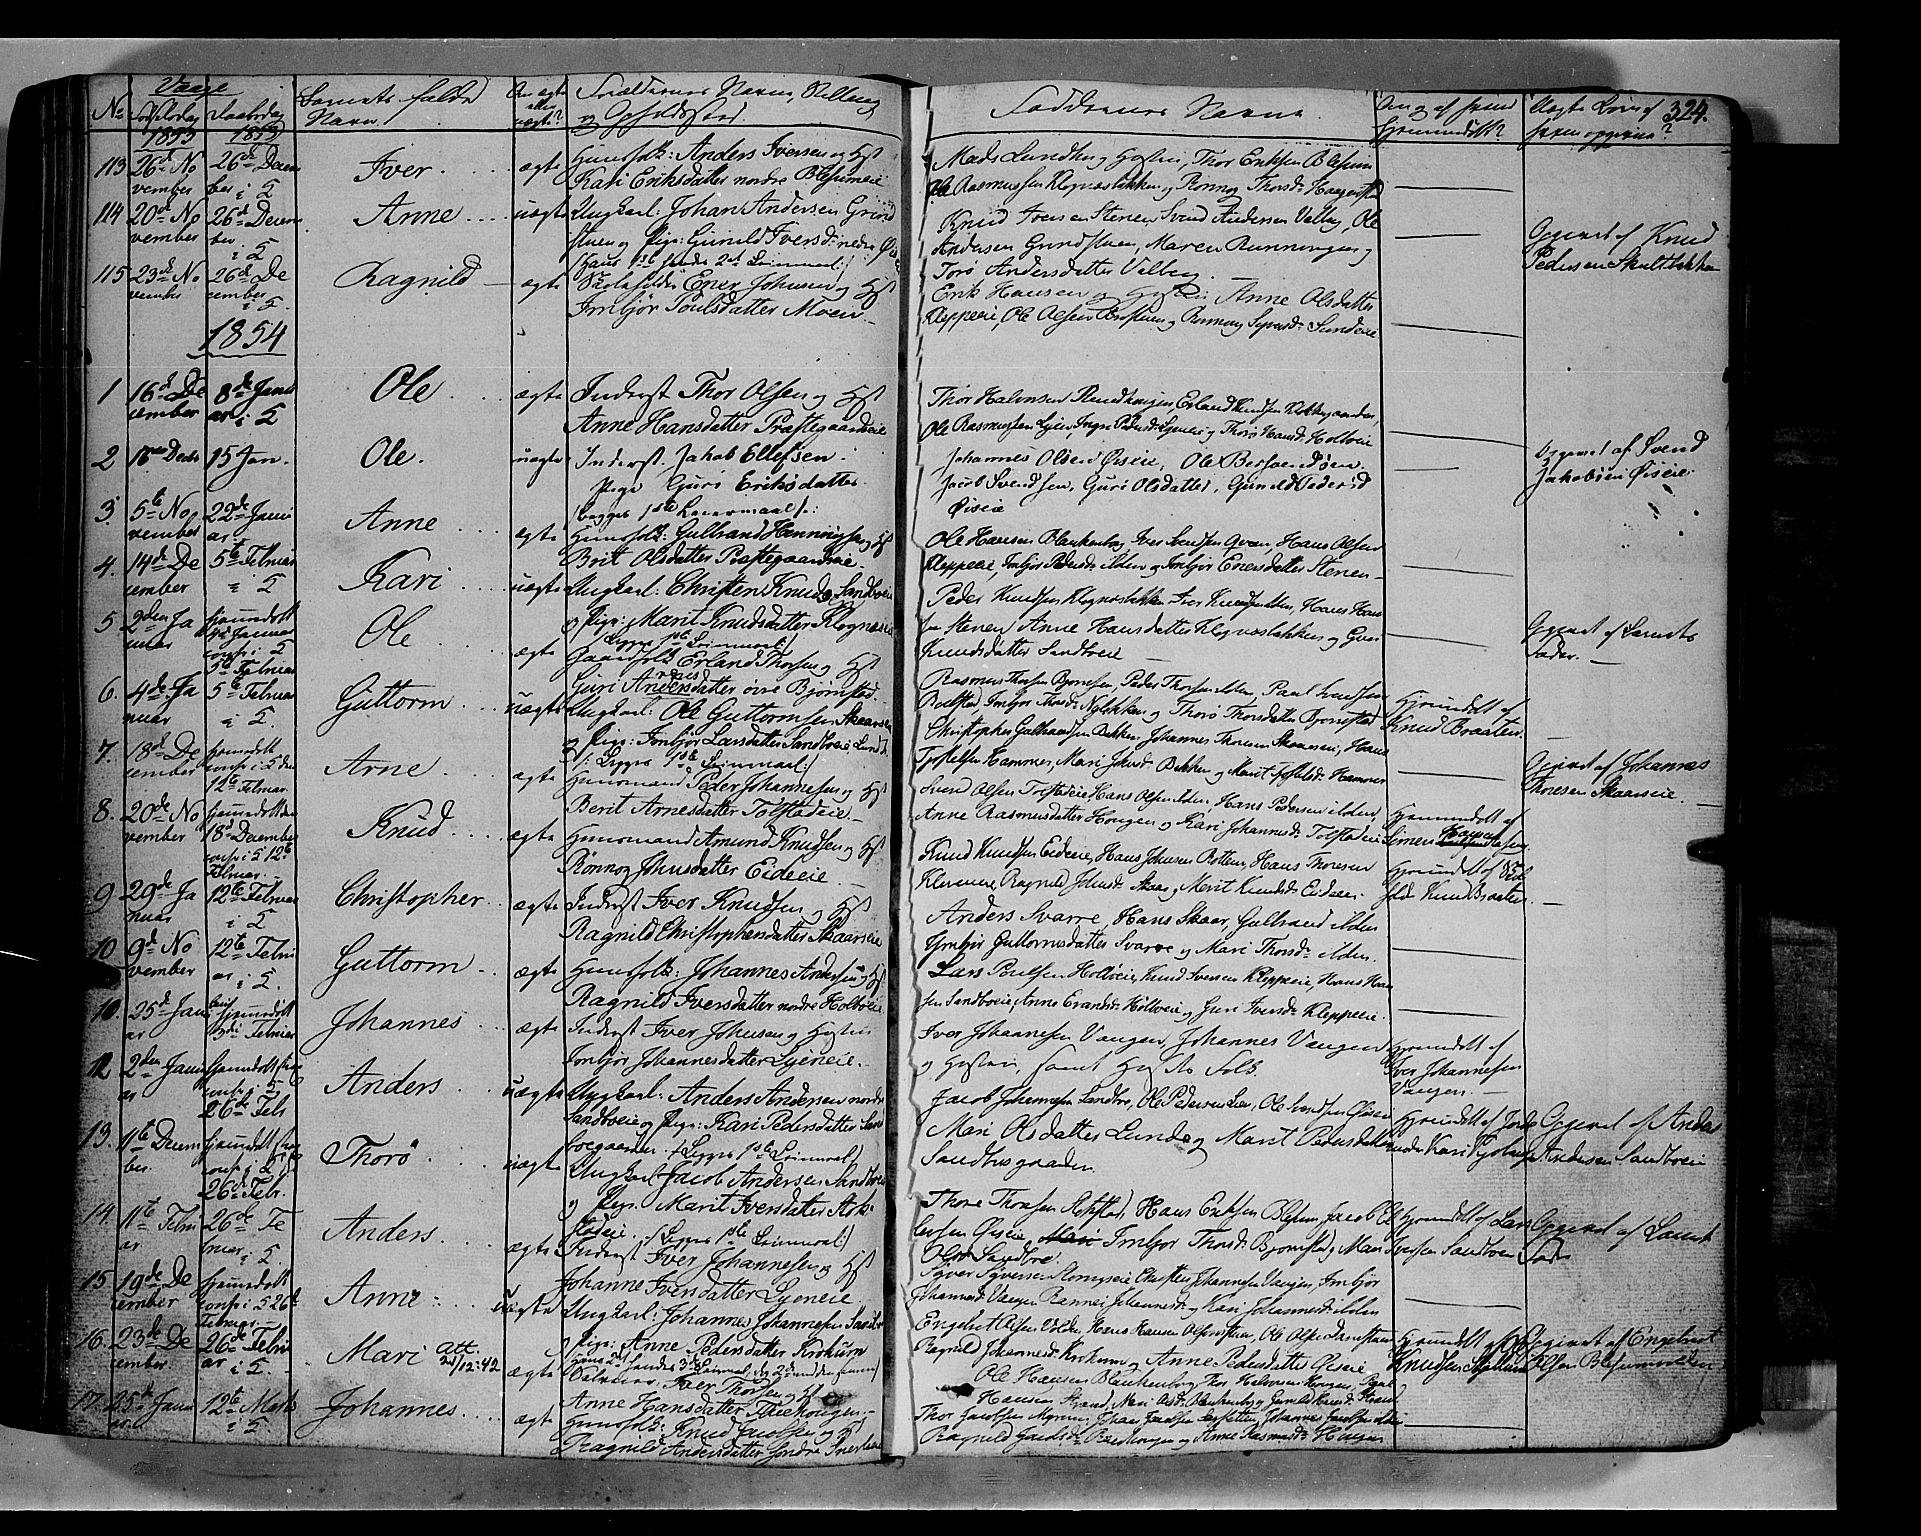 SAH, Vågå prestekontor, Ministerialbok nr. 5 /1, 1842-1856, s. 324